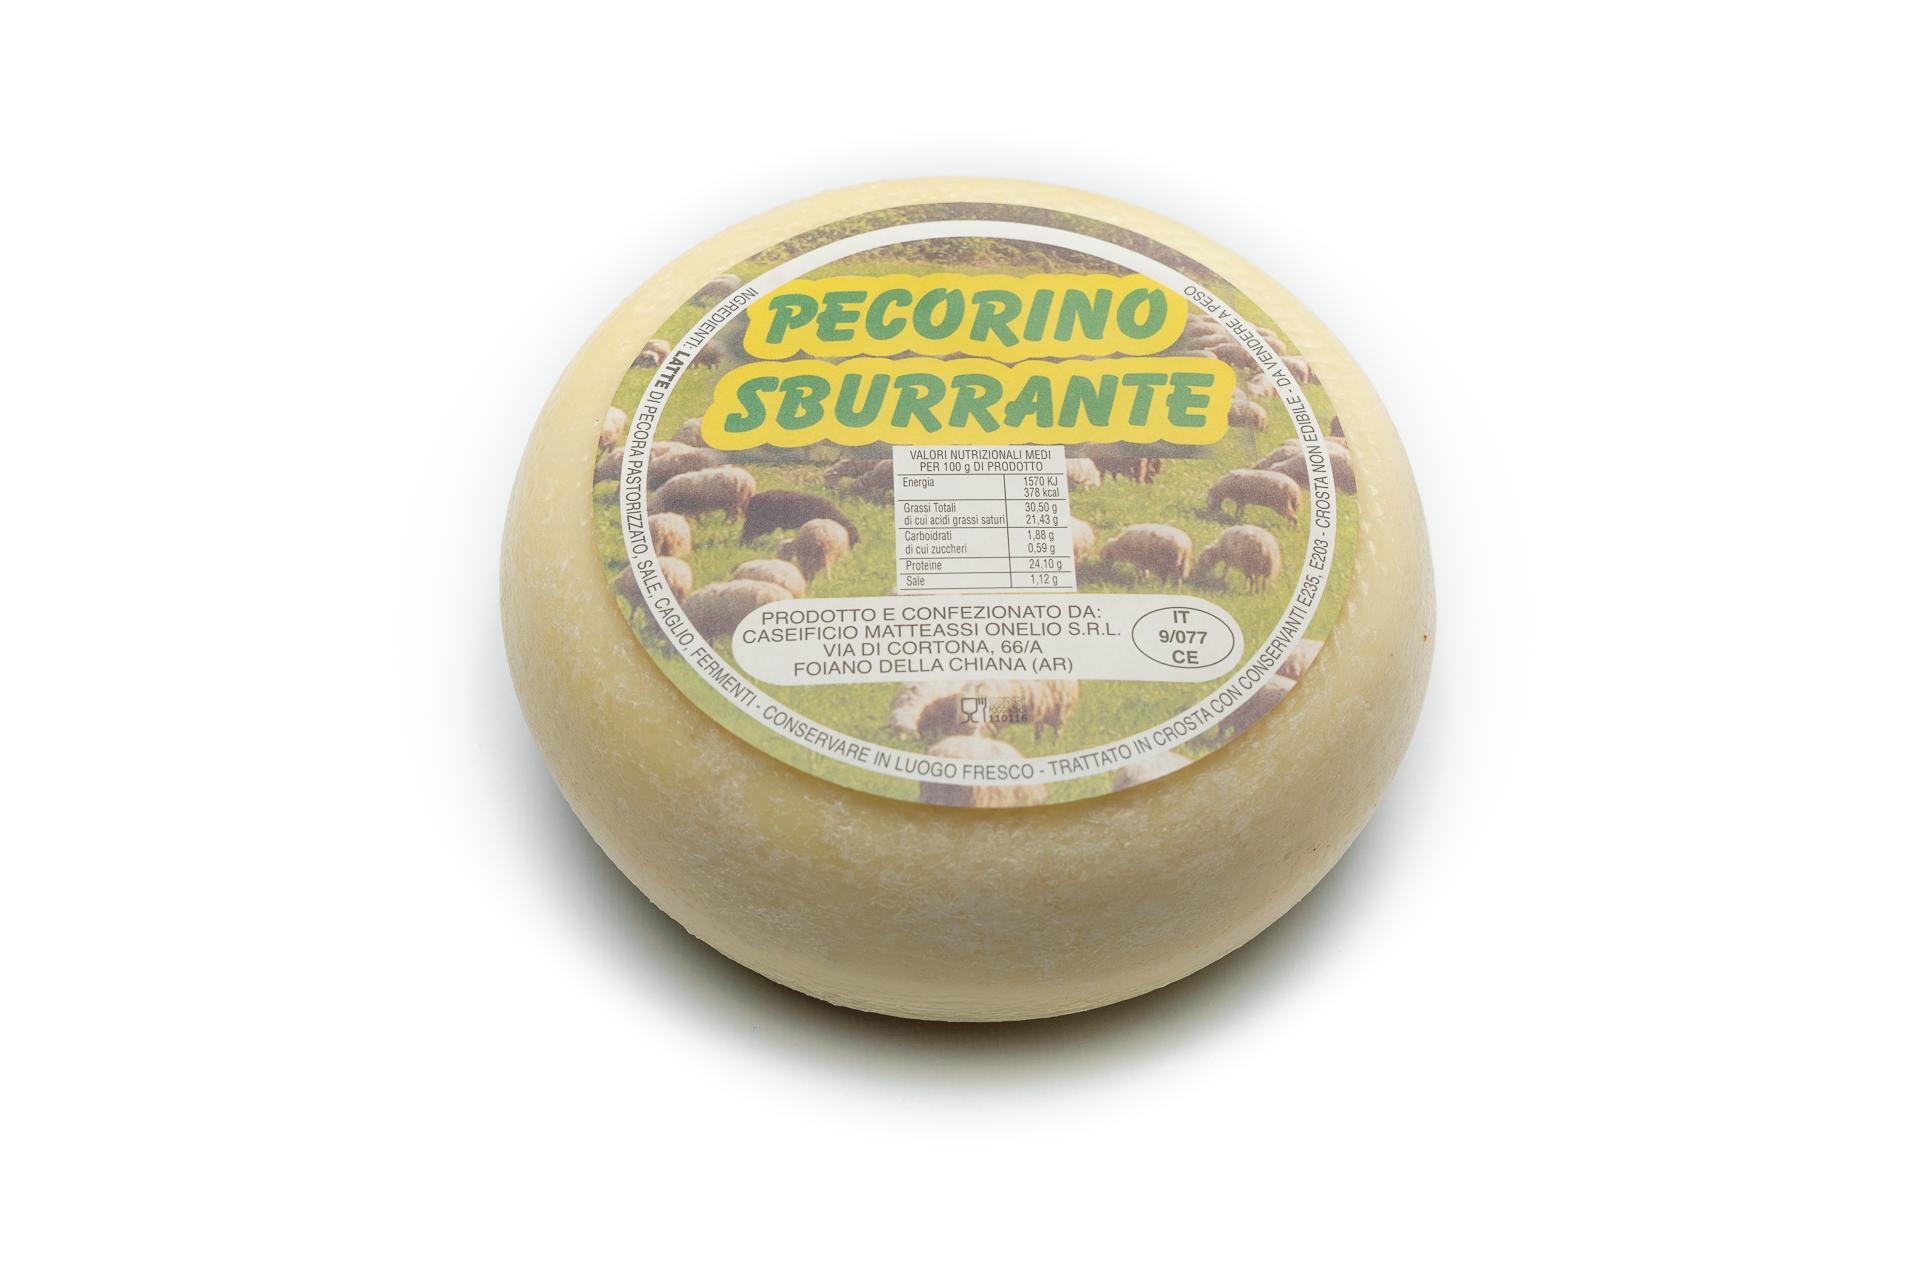 Pecorino Sburrante